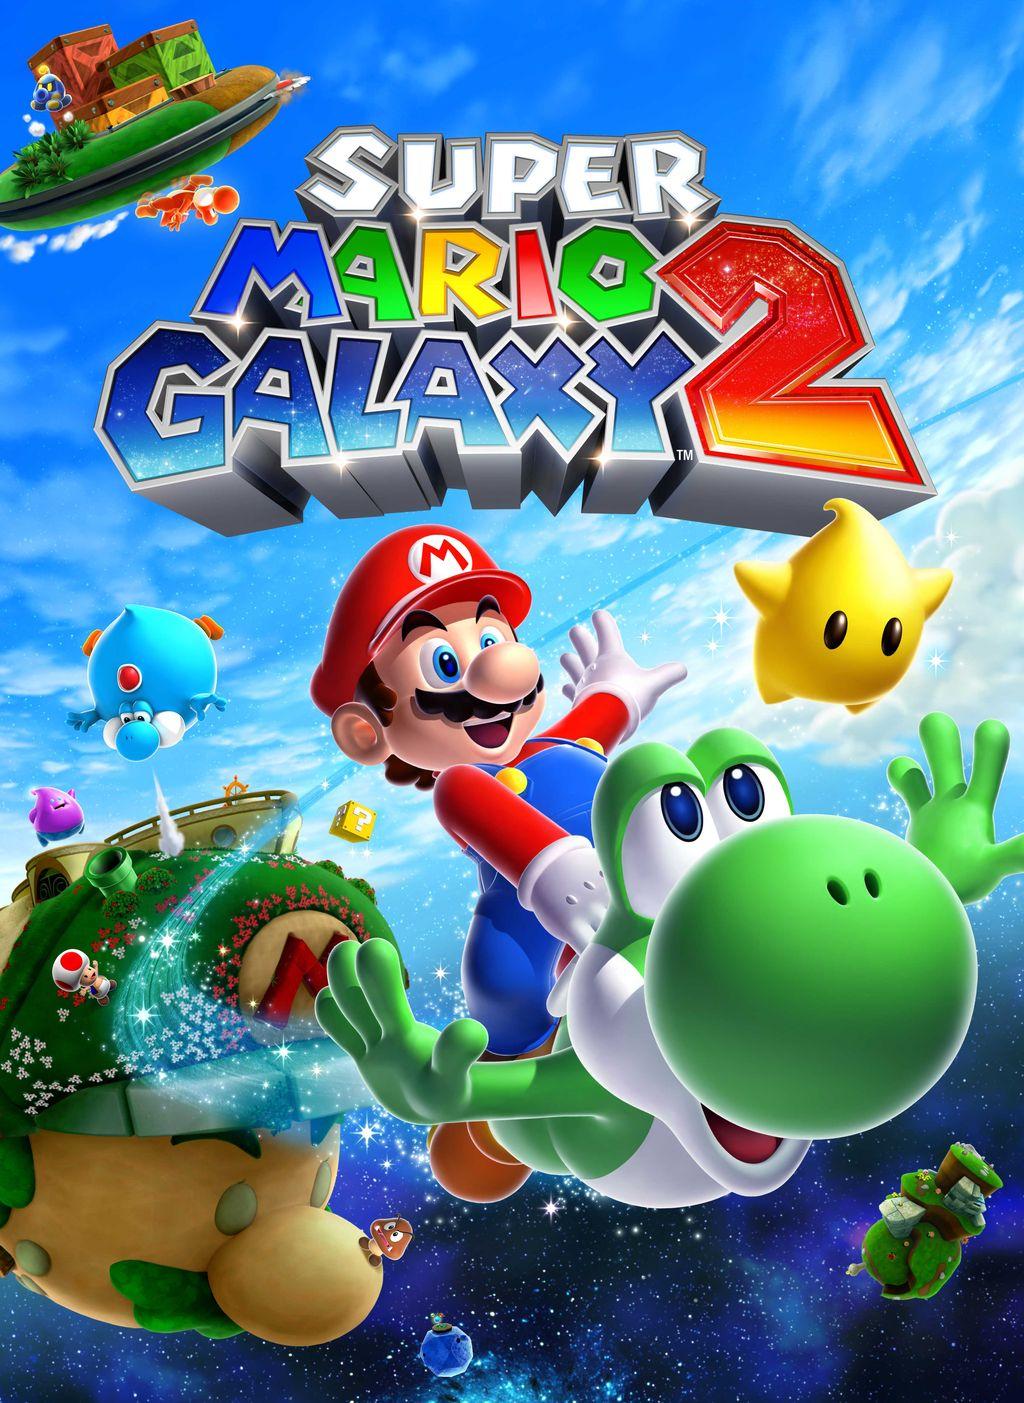 SuperMarioGalaxy2 Wii